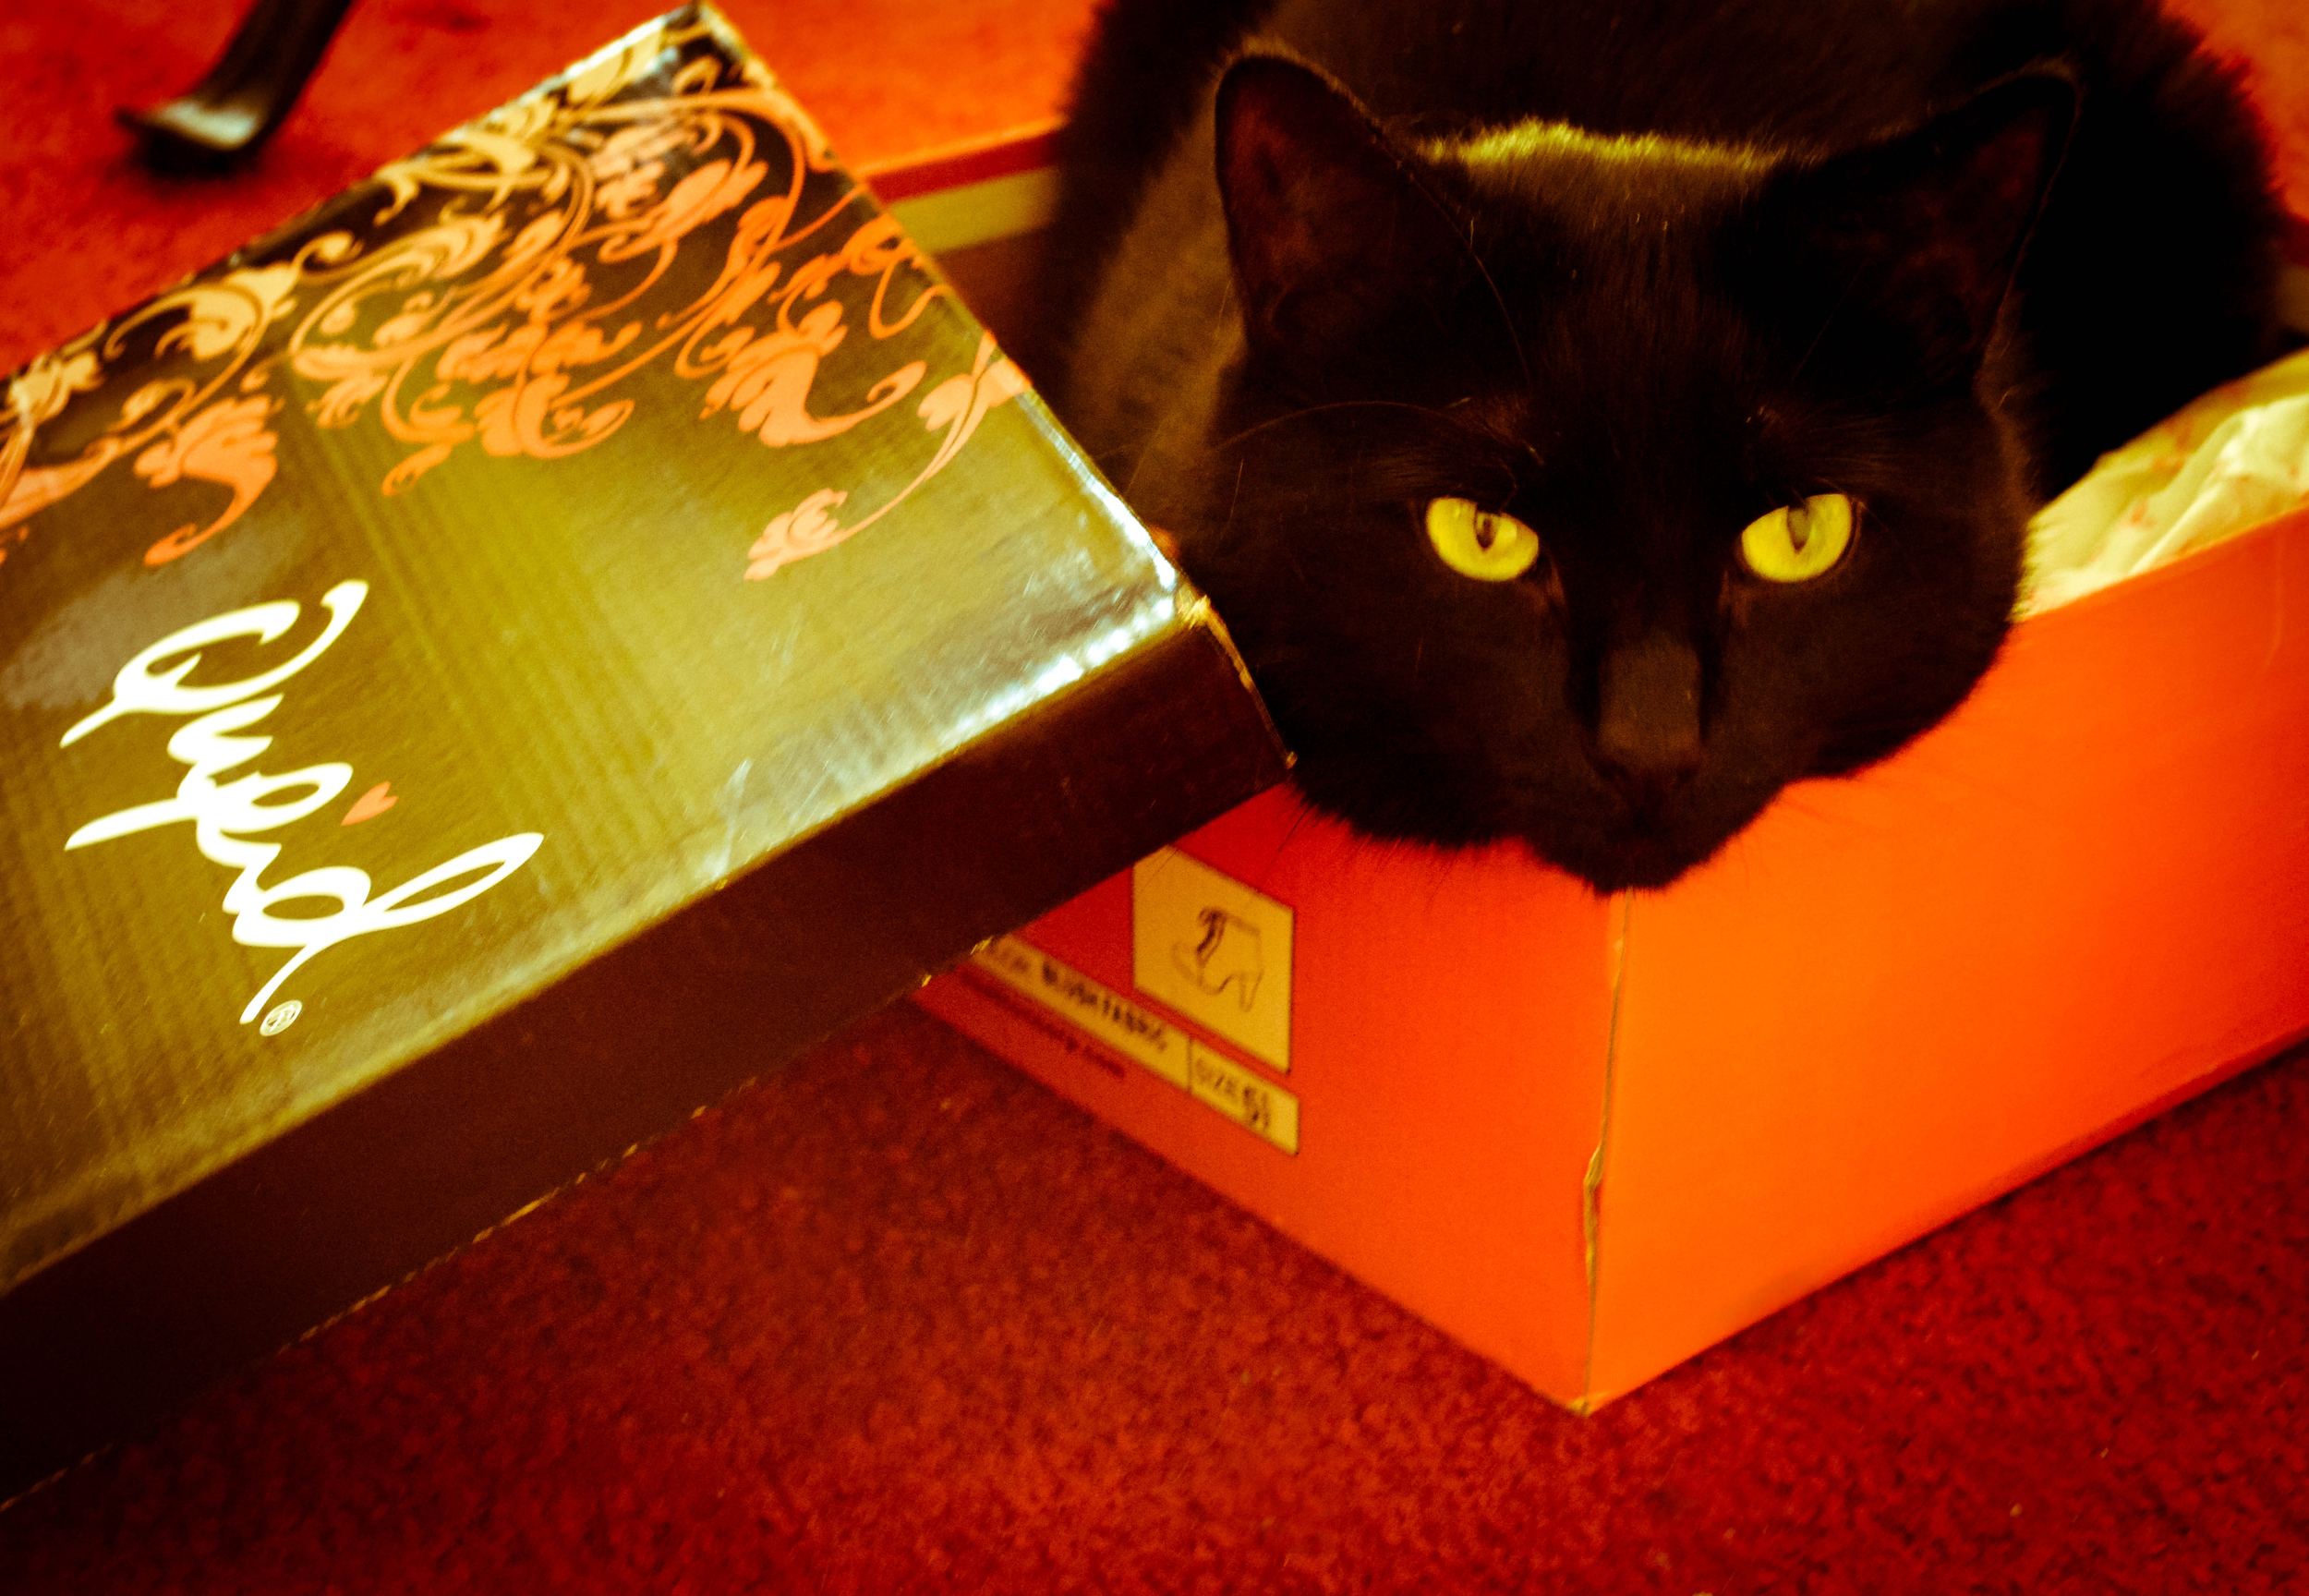 Ms. Lilli in her vegan boot box.